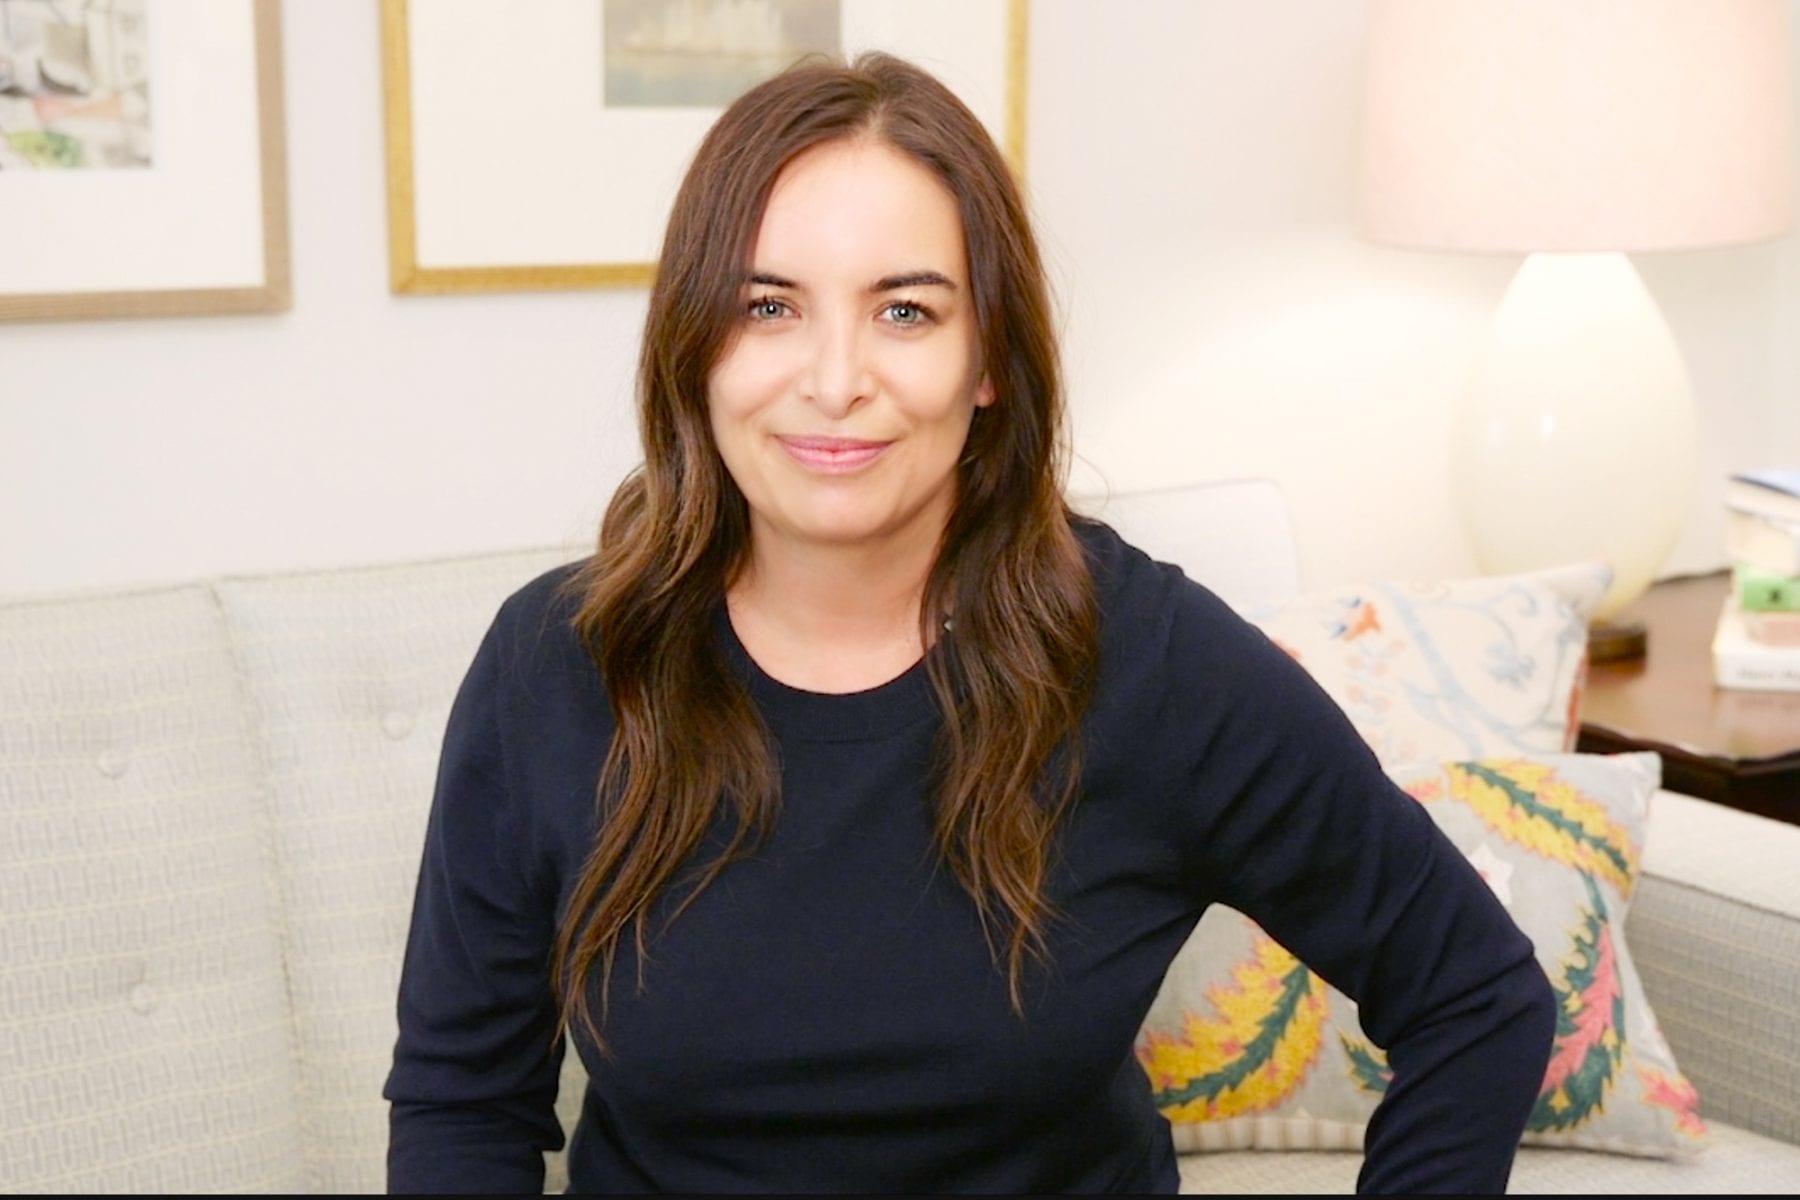 Meet International Makeup Artist Wendy Rowe